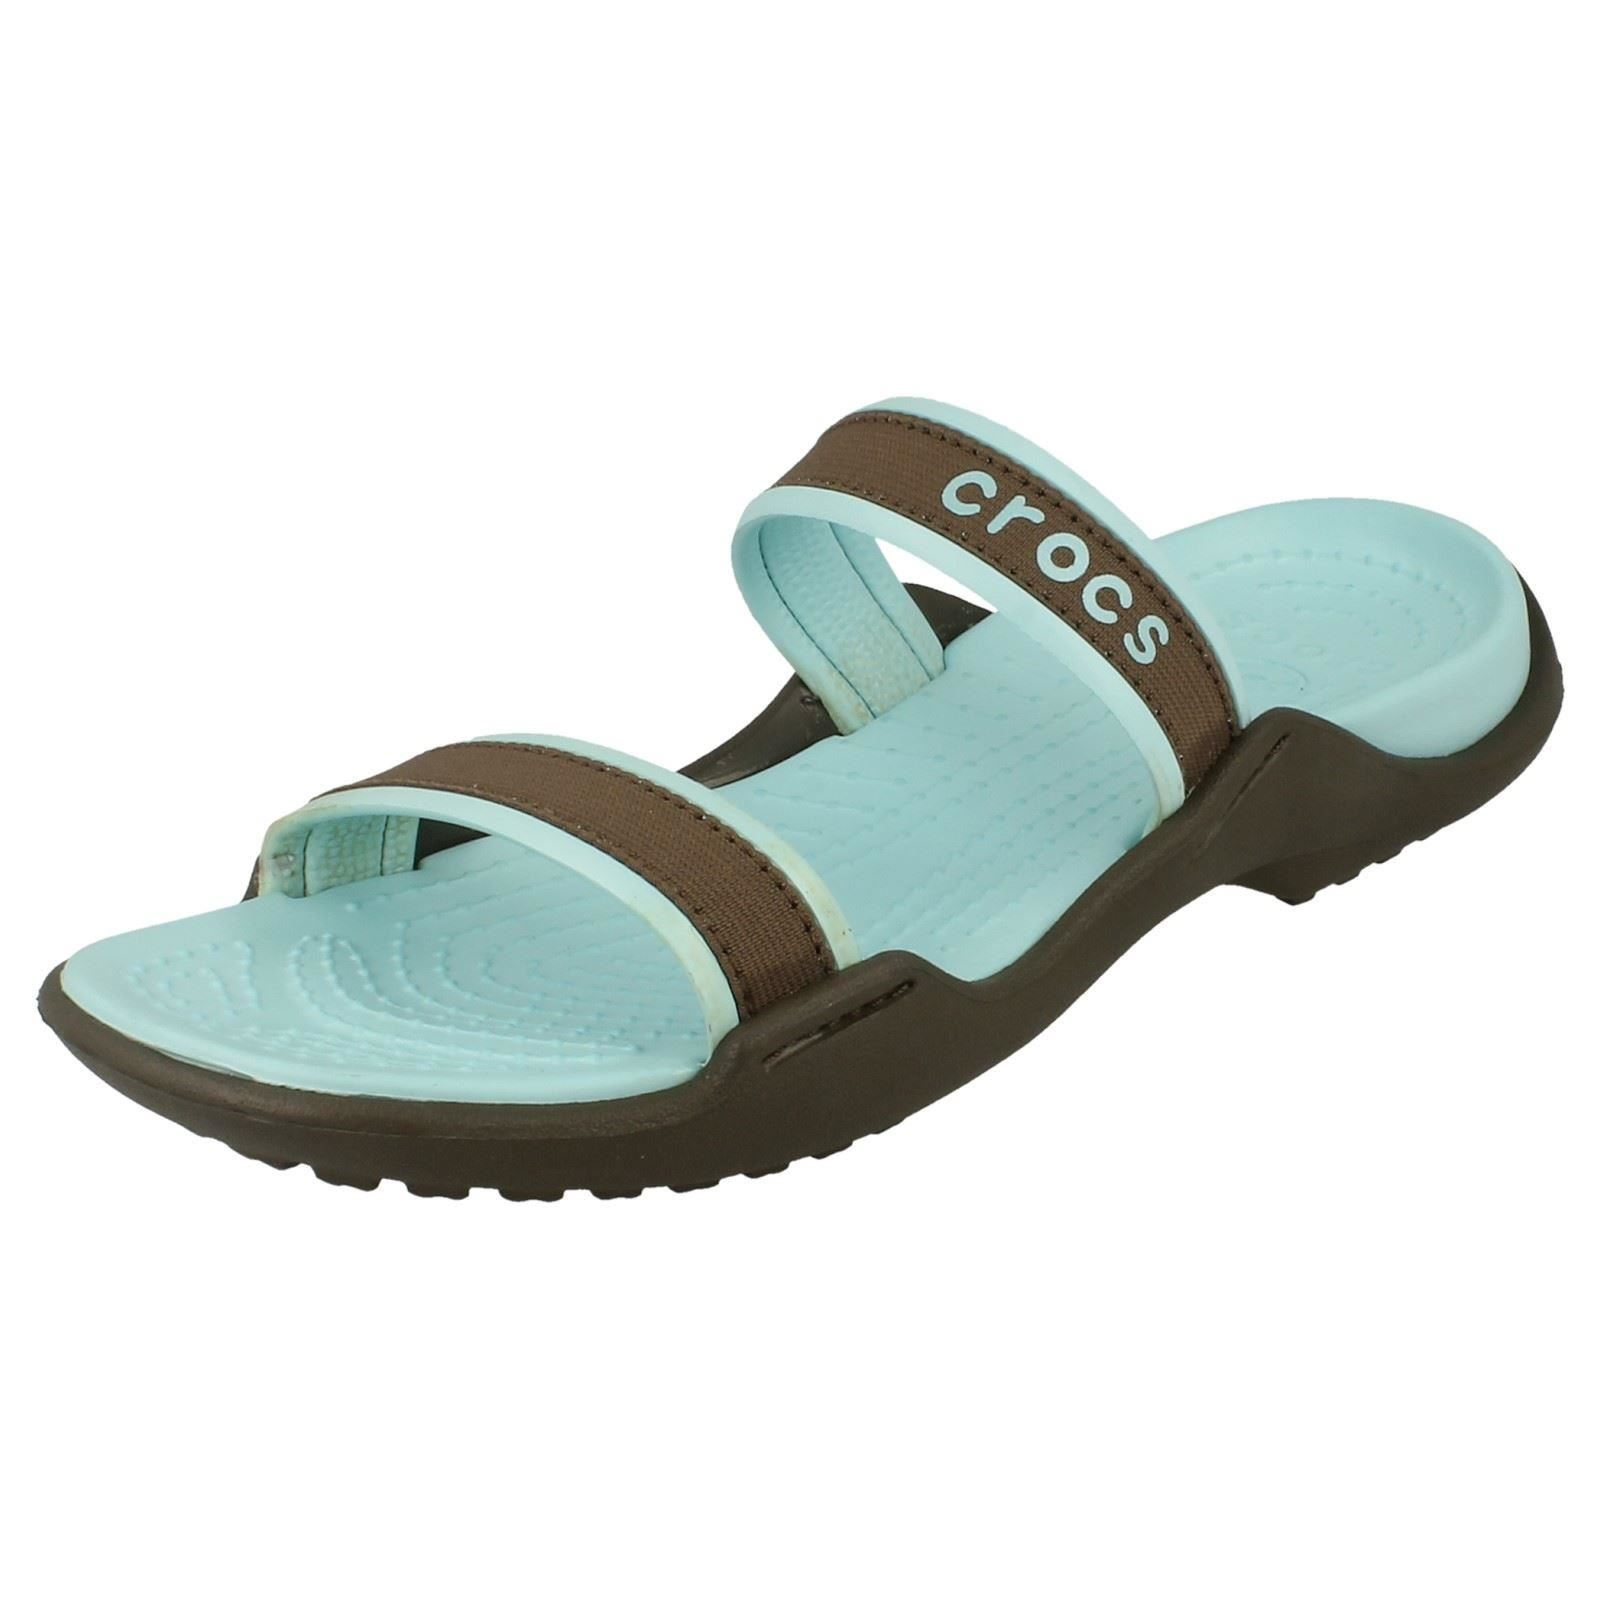 Ladies Crocs Slip On Summer Sandals 'Patra' ~ K | eBay - photo#42